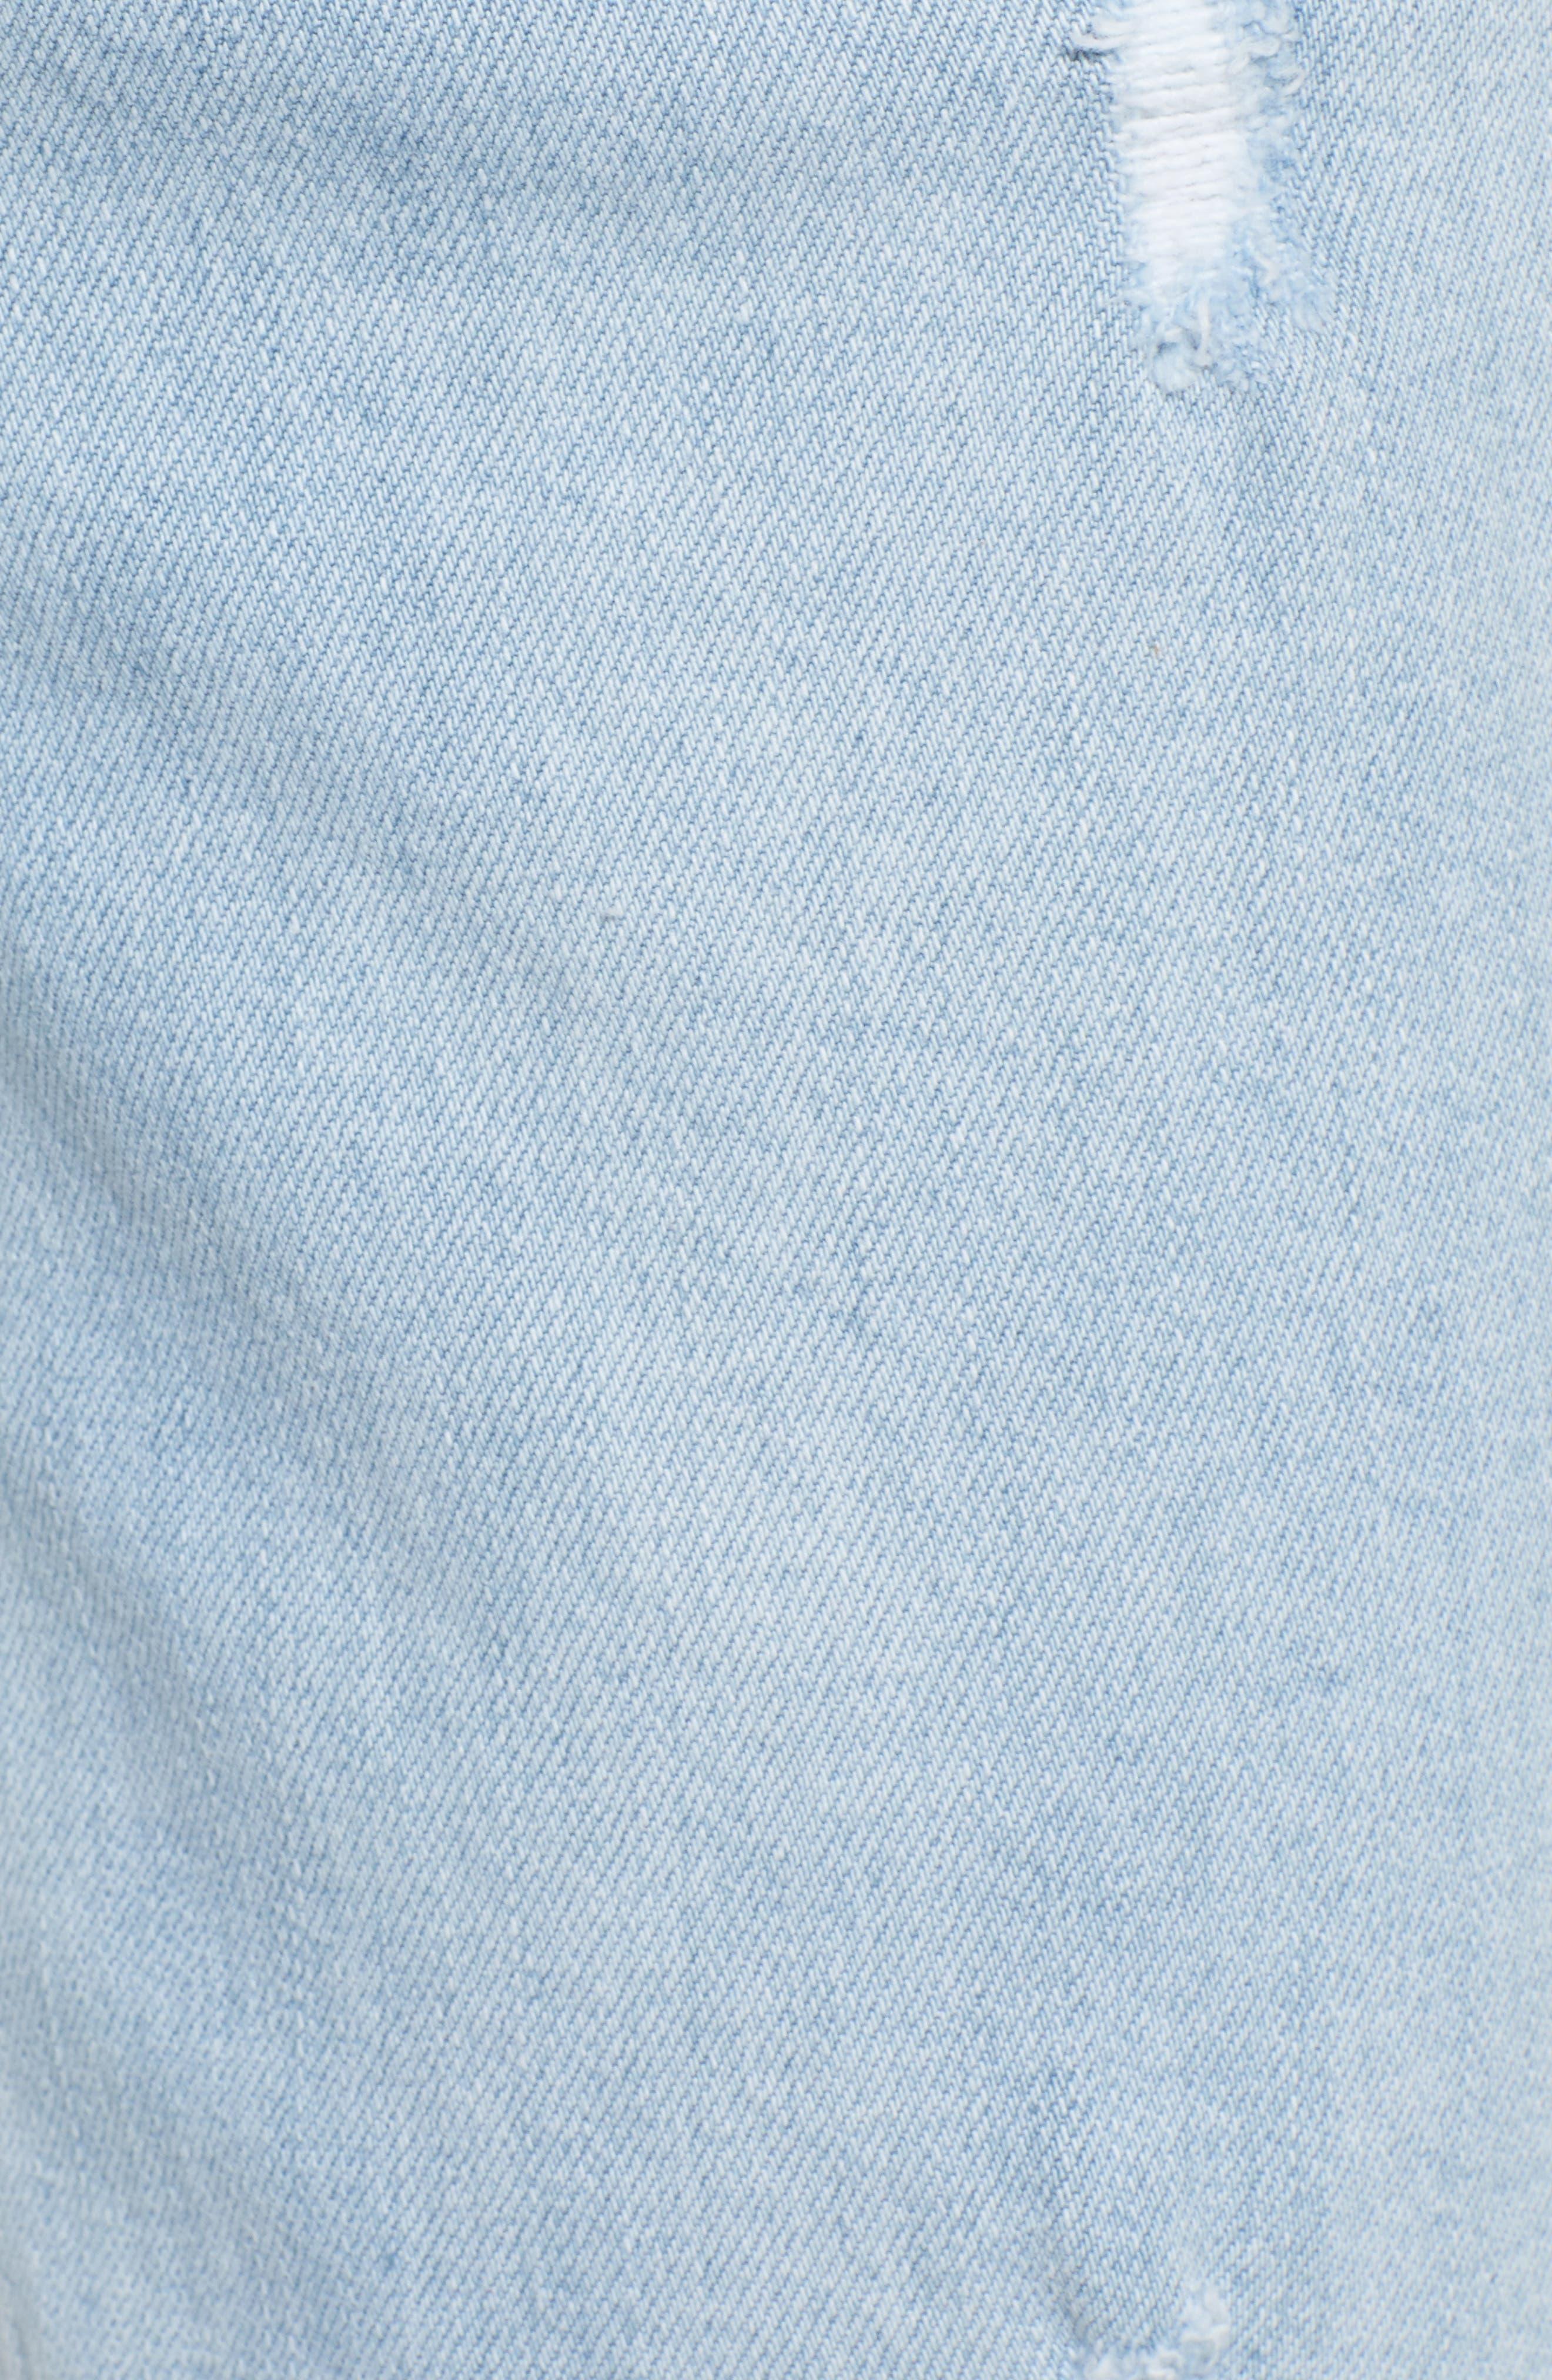 Grommet Hem Distressed Crop Jeans,                             Alternate thumbnail 6, color,                             Light Wash